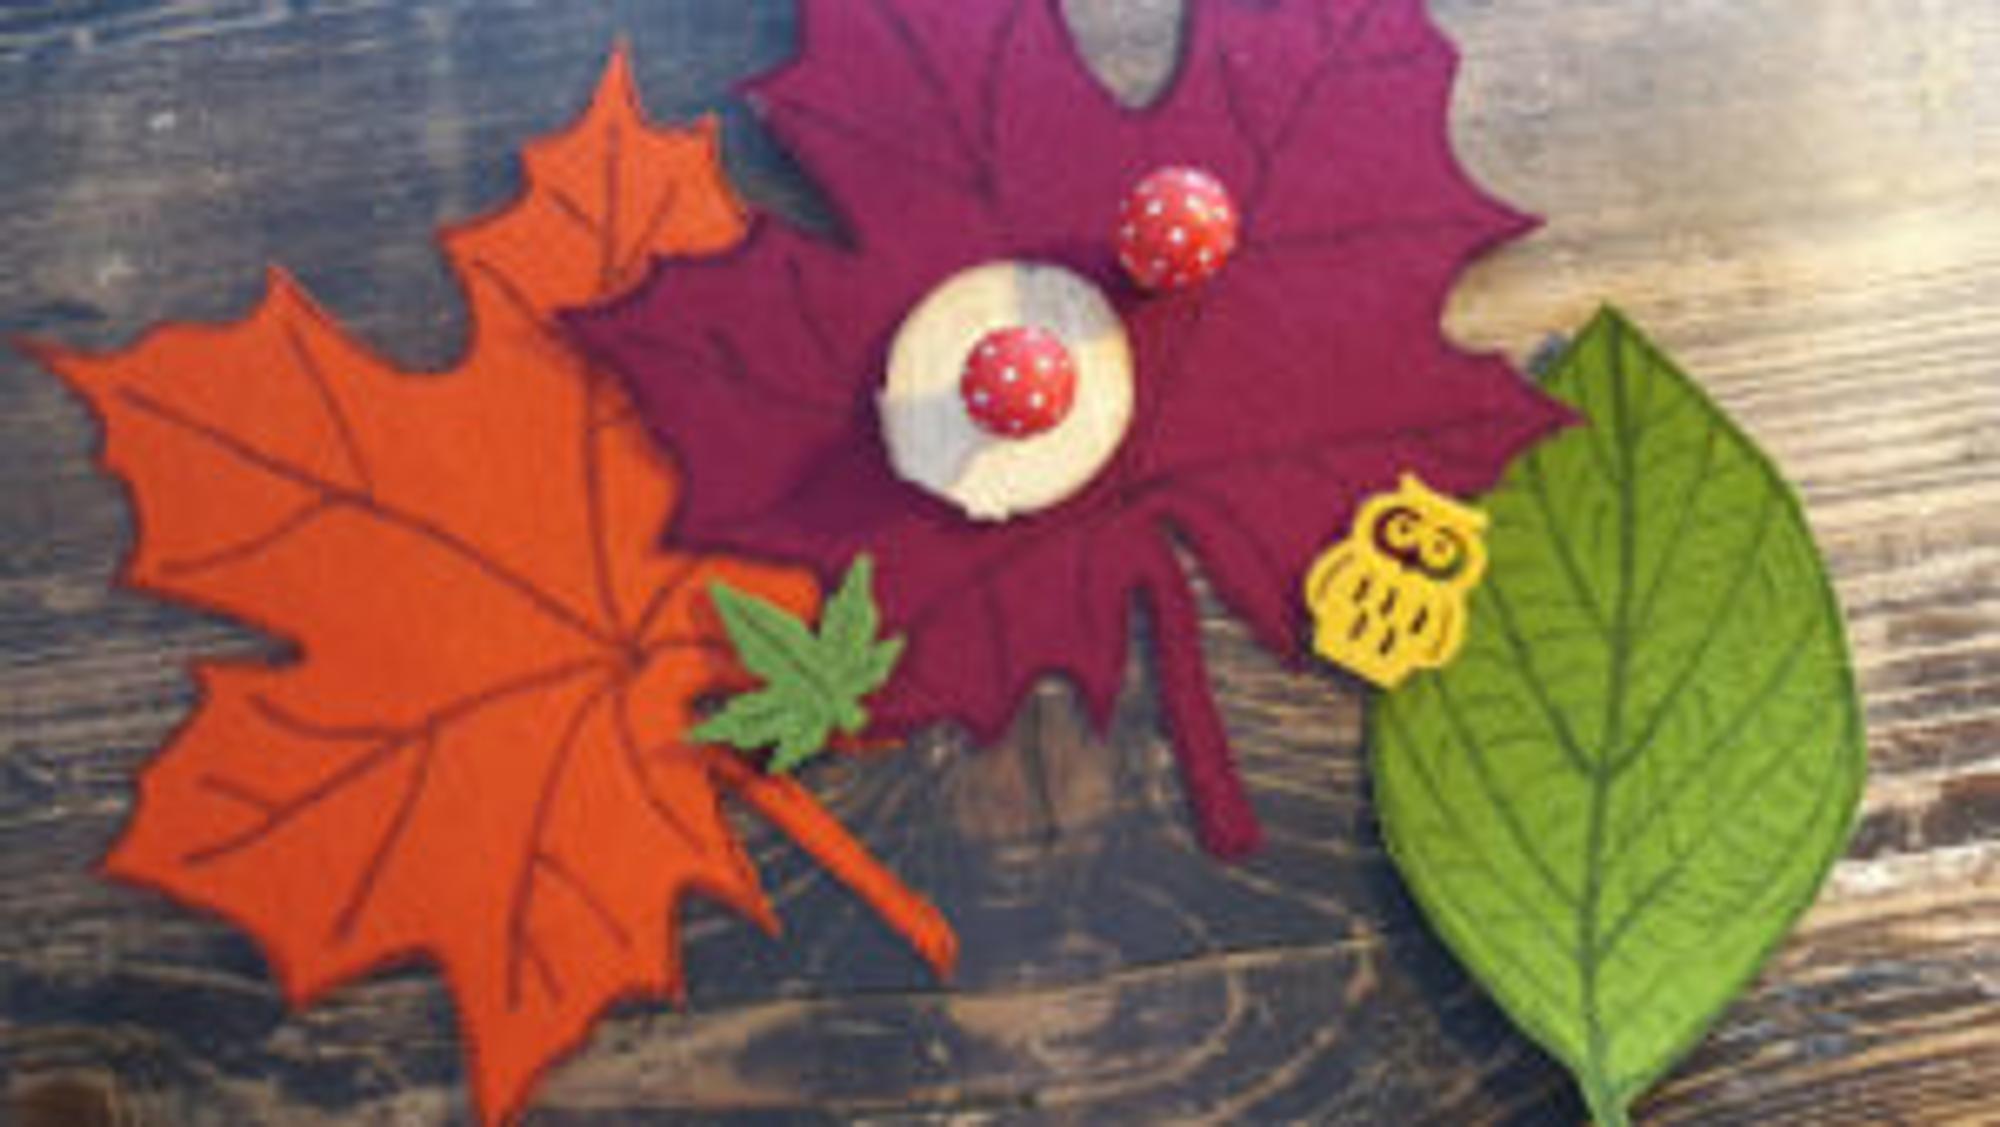 Herbstdeko Basteln - Blatt-Untersetzer aus Filz